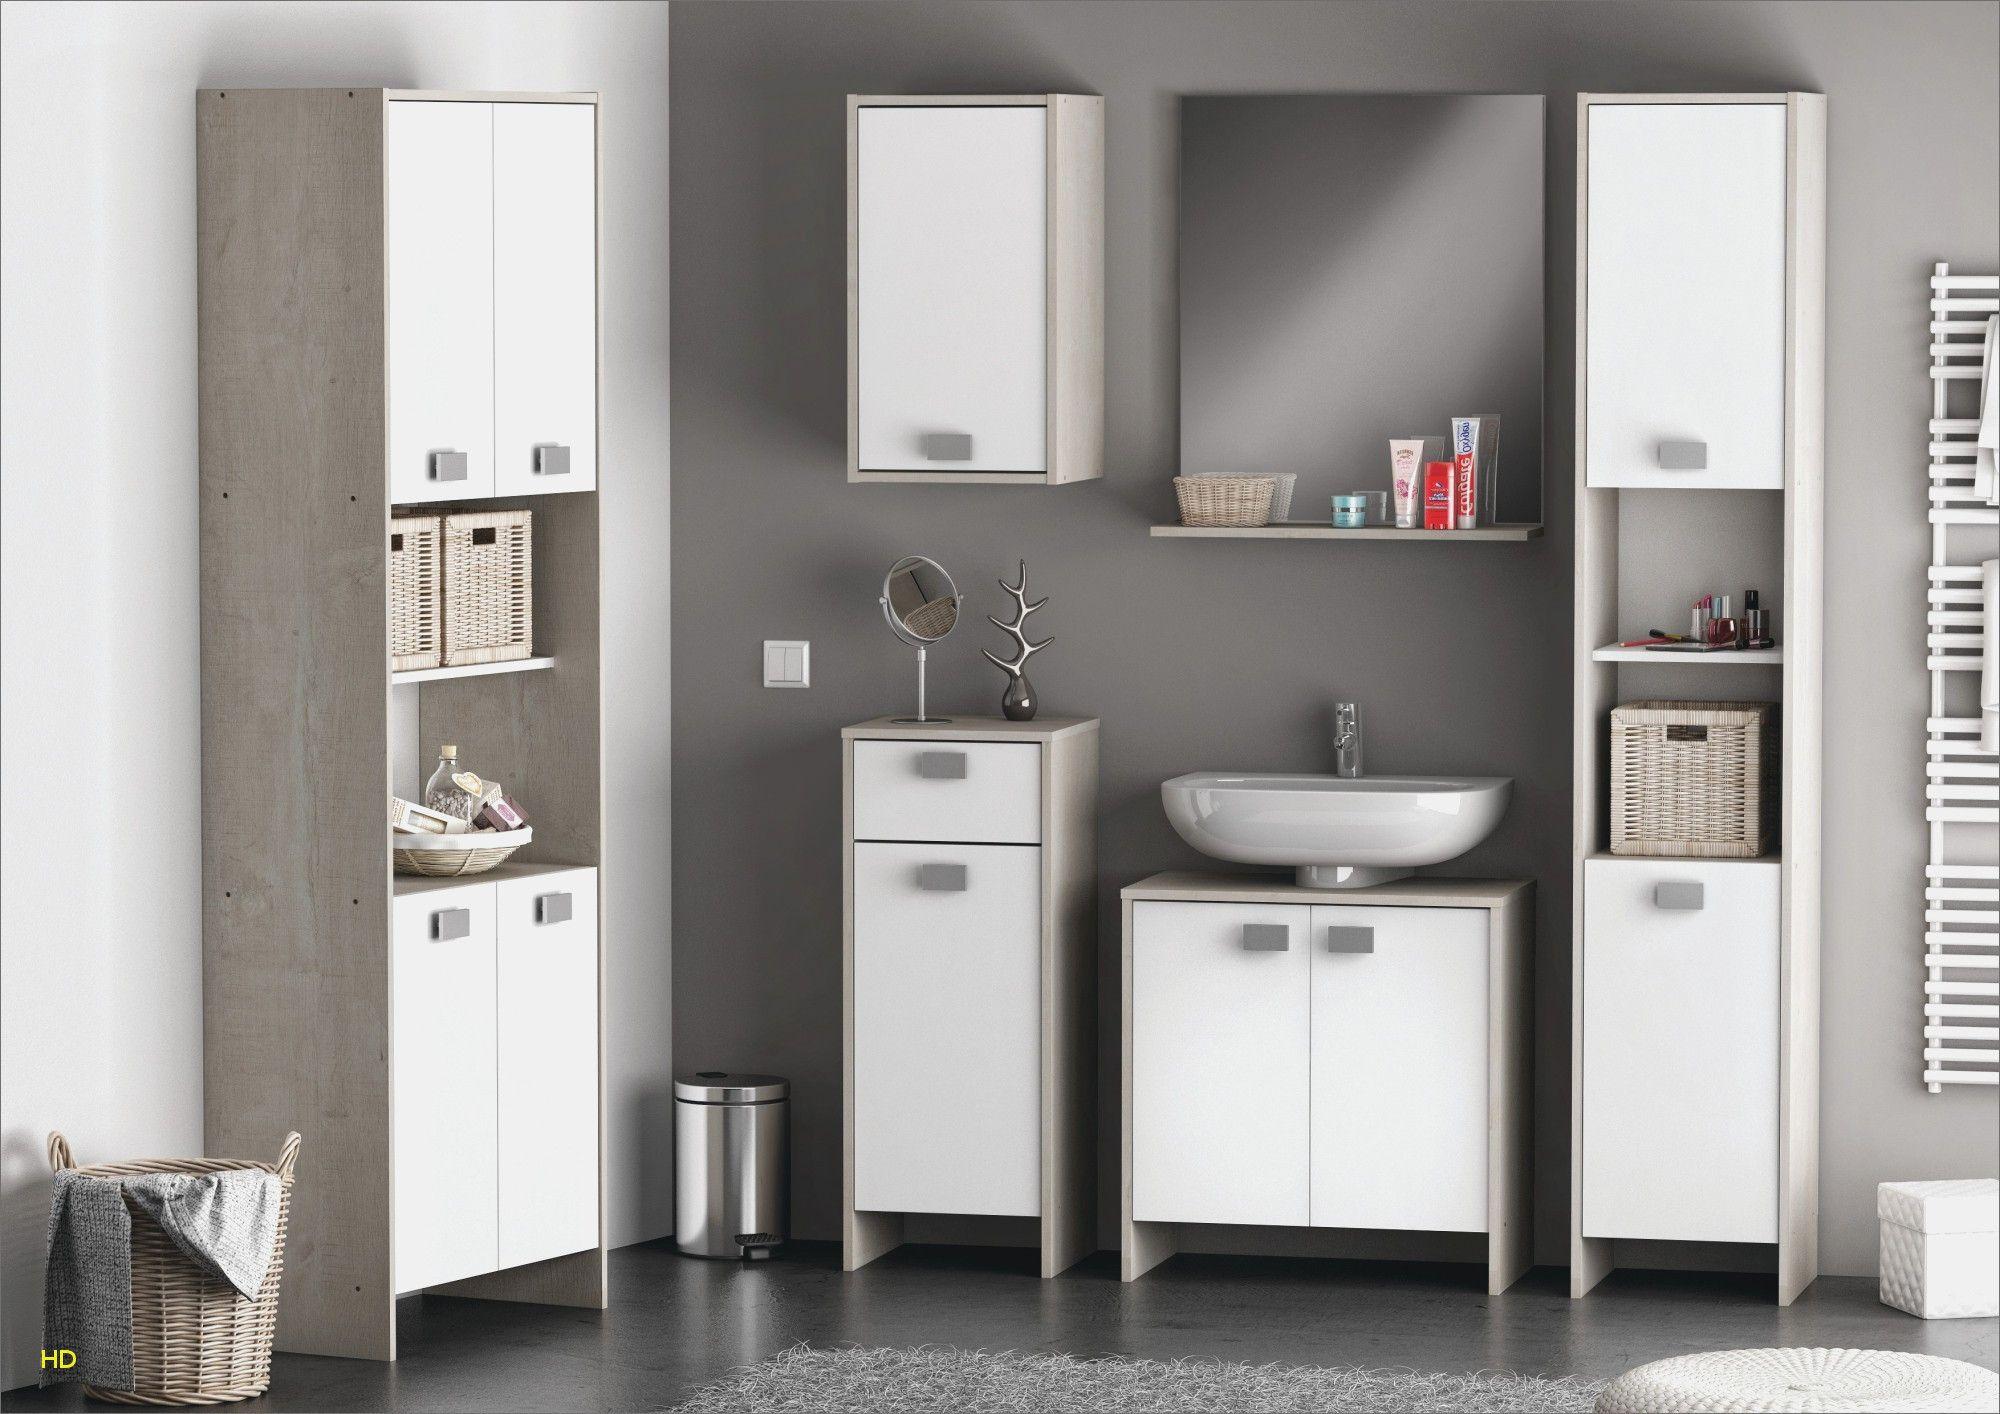 Elegant Fixation Meuble Salle De Bain Bathroom Remodel Designs Bathrooms Remodel Bathroom Vanity